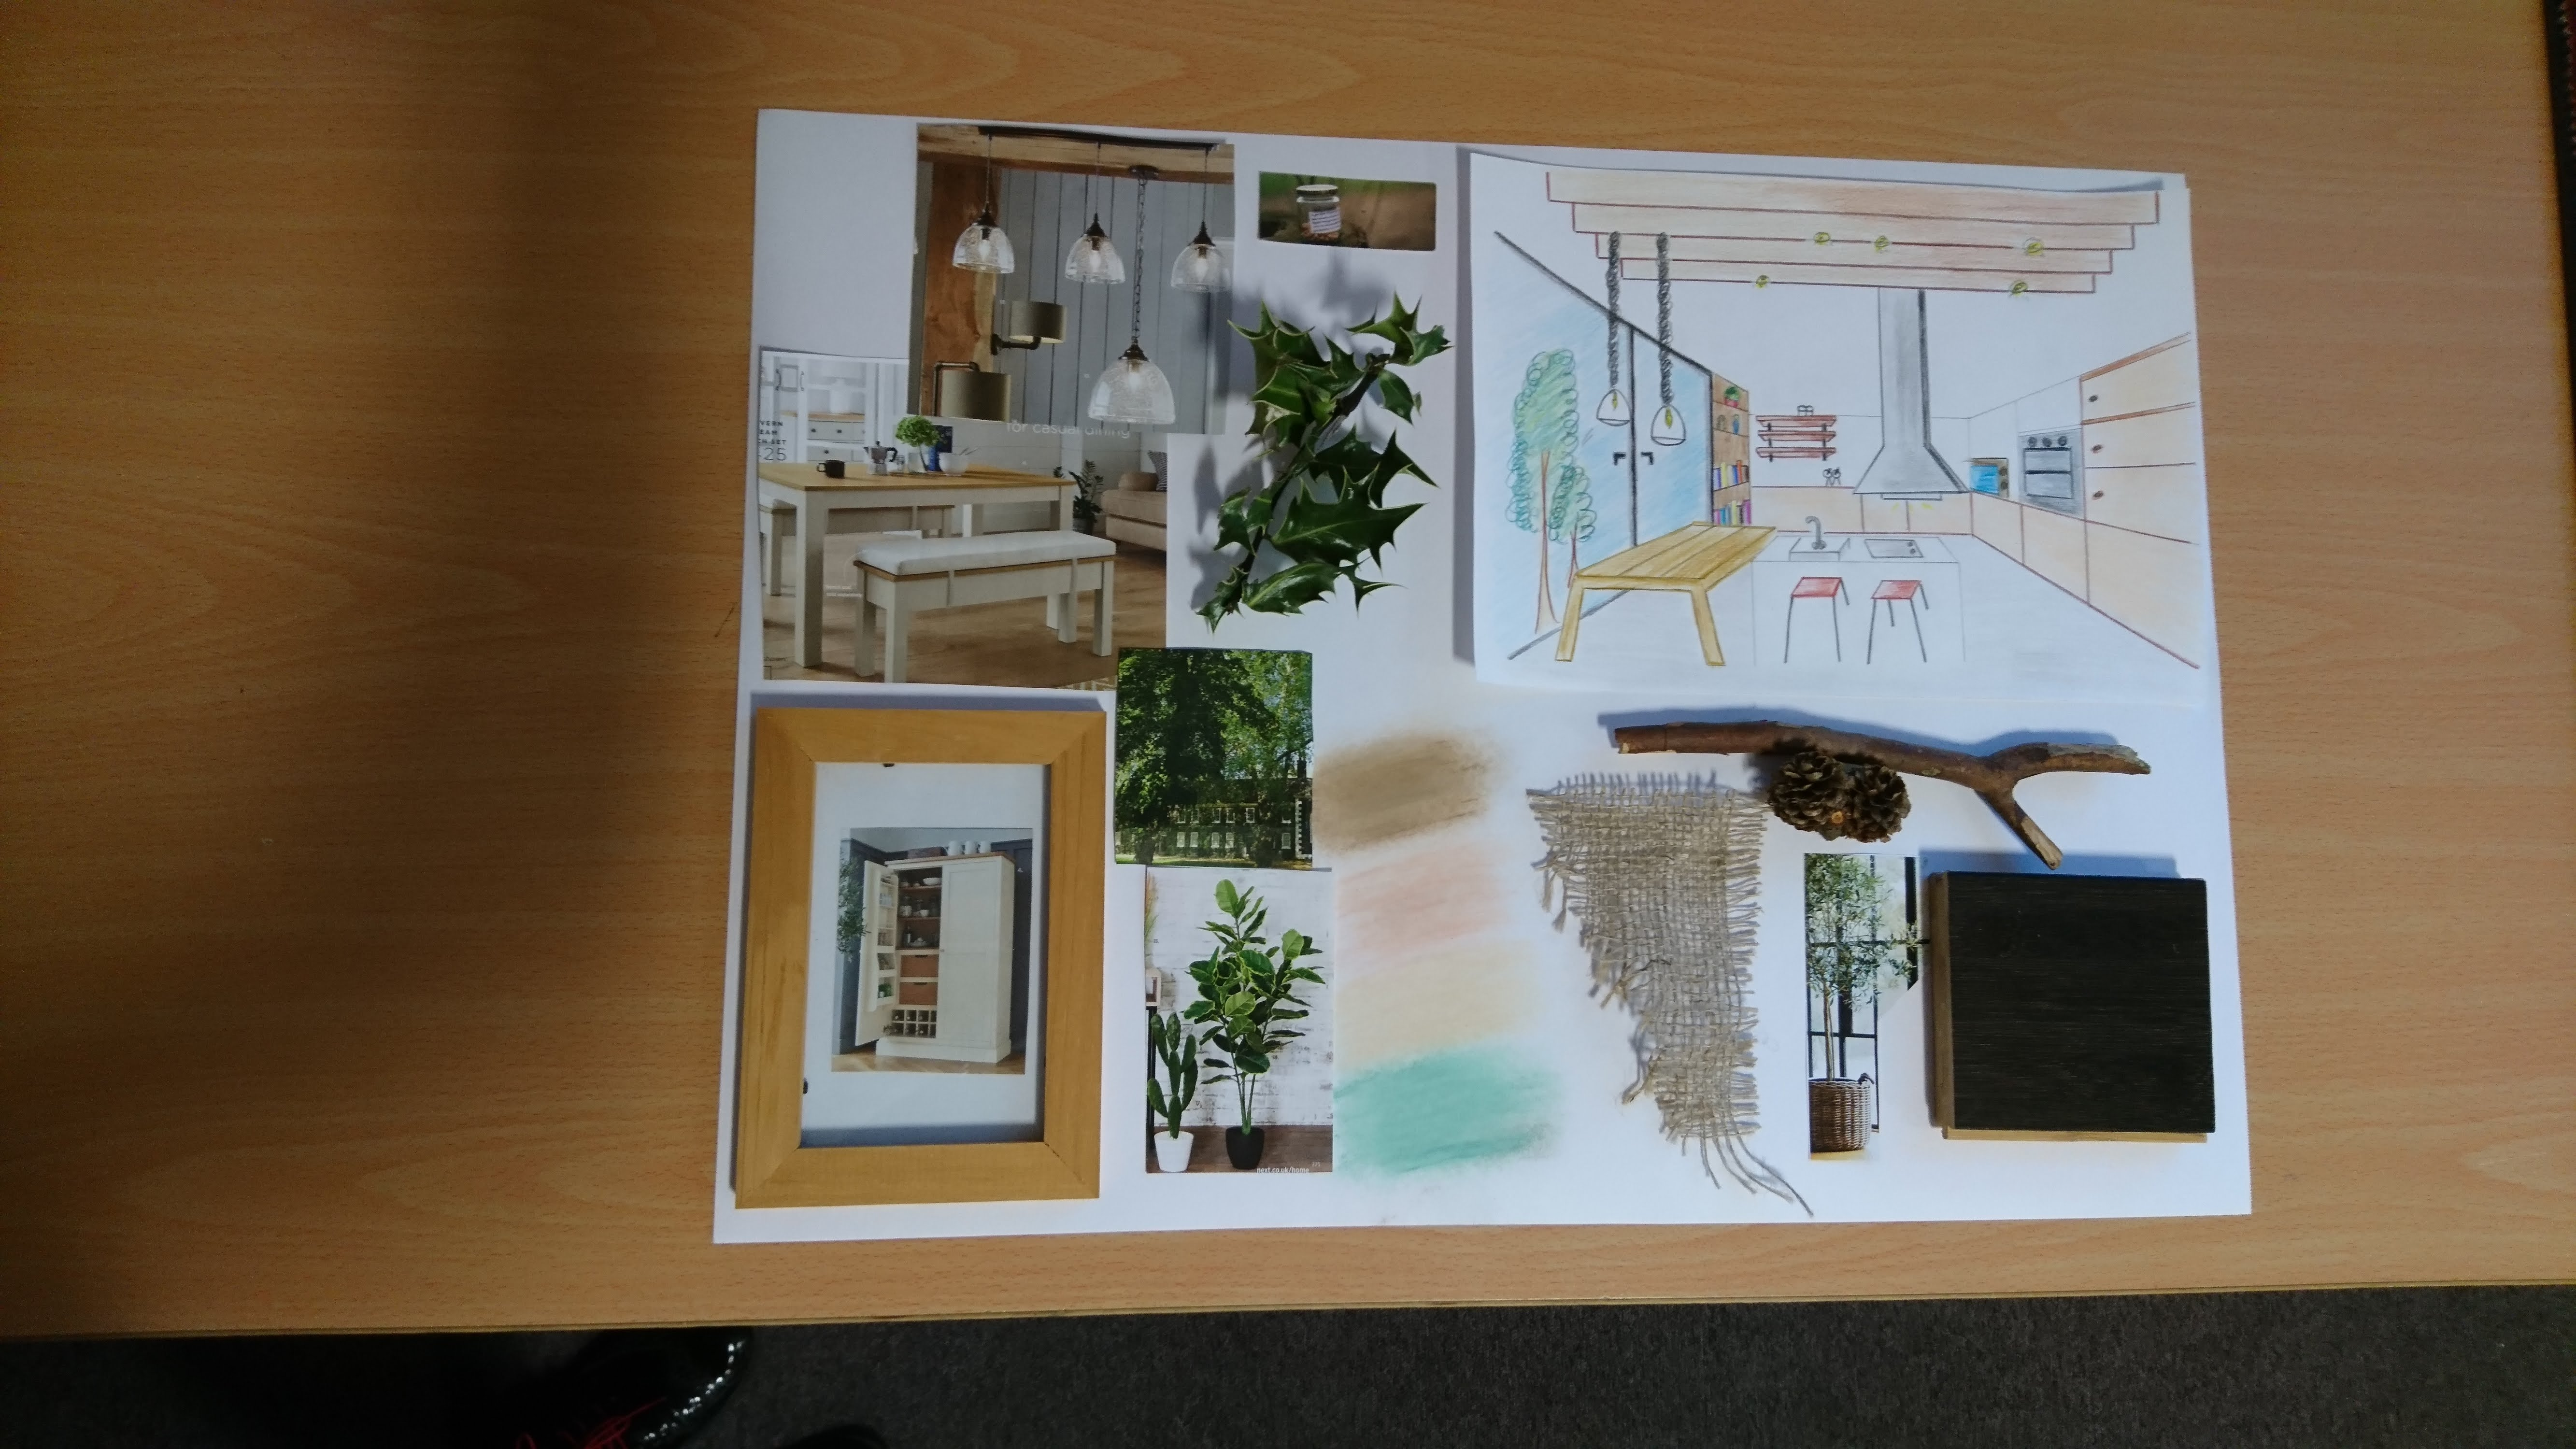 Interior design tips presentation board interior - What is interior design ...